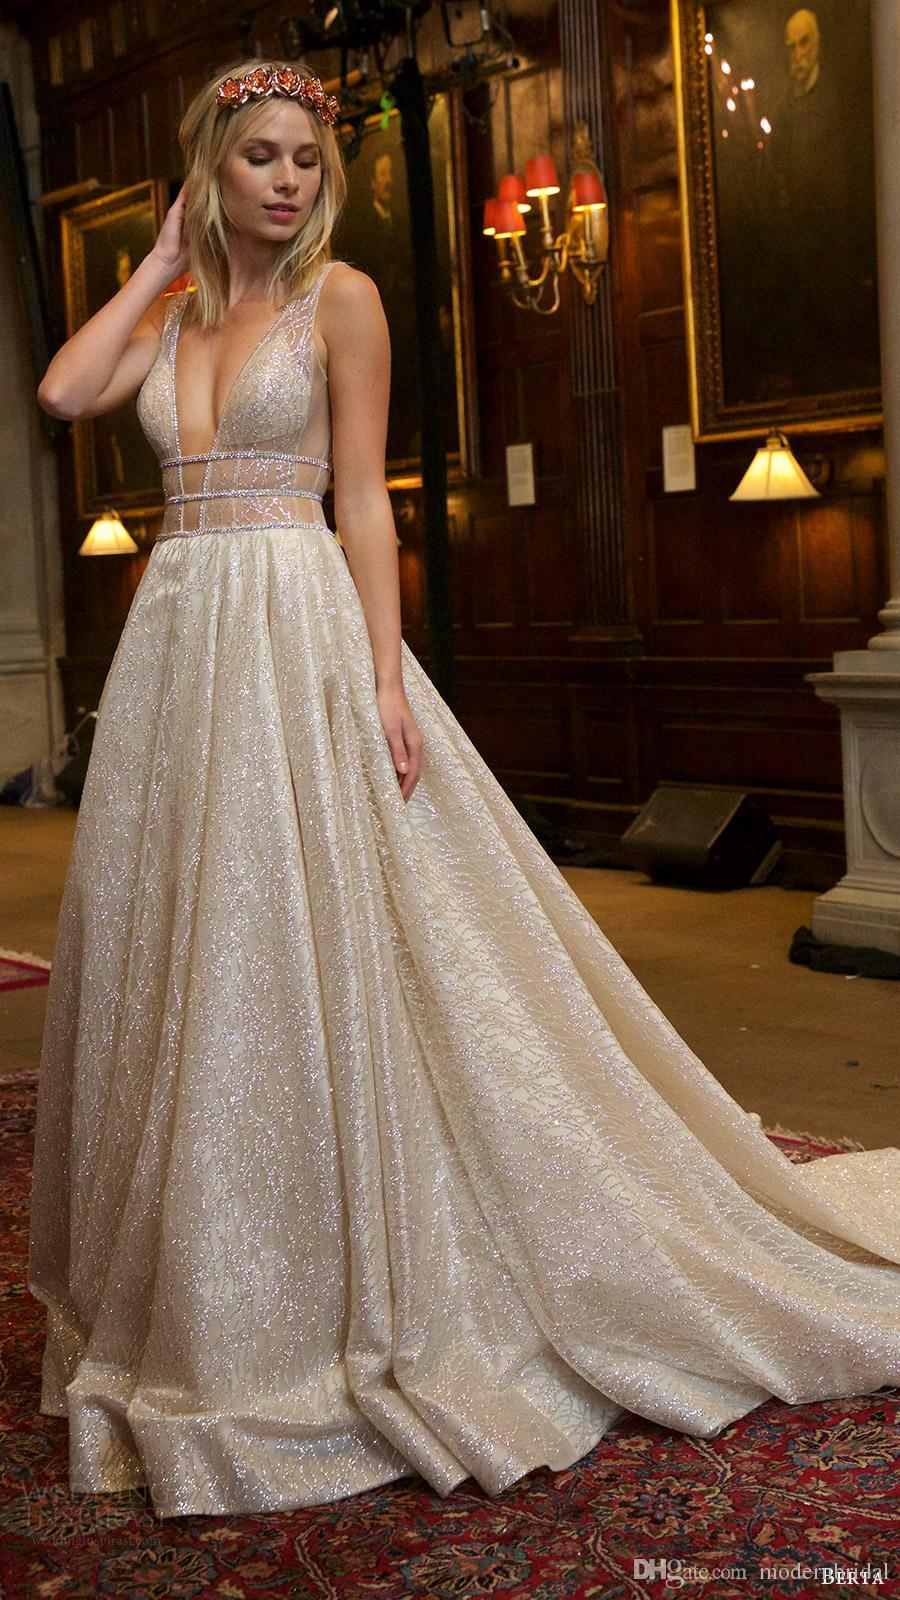 2017 Berta Bridal Wedding Dresses Deep V Neckline Sequin Lace Beaded ...